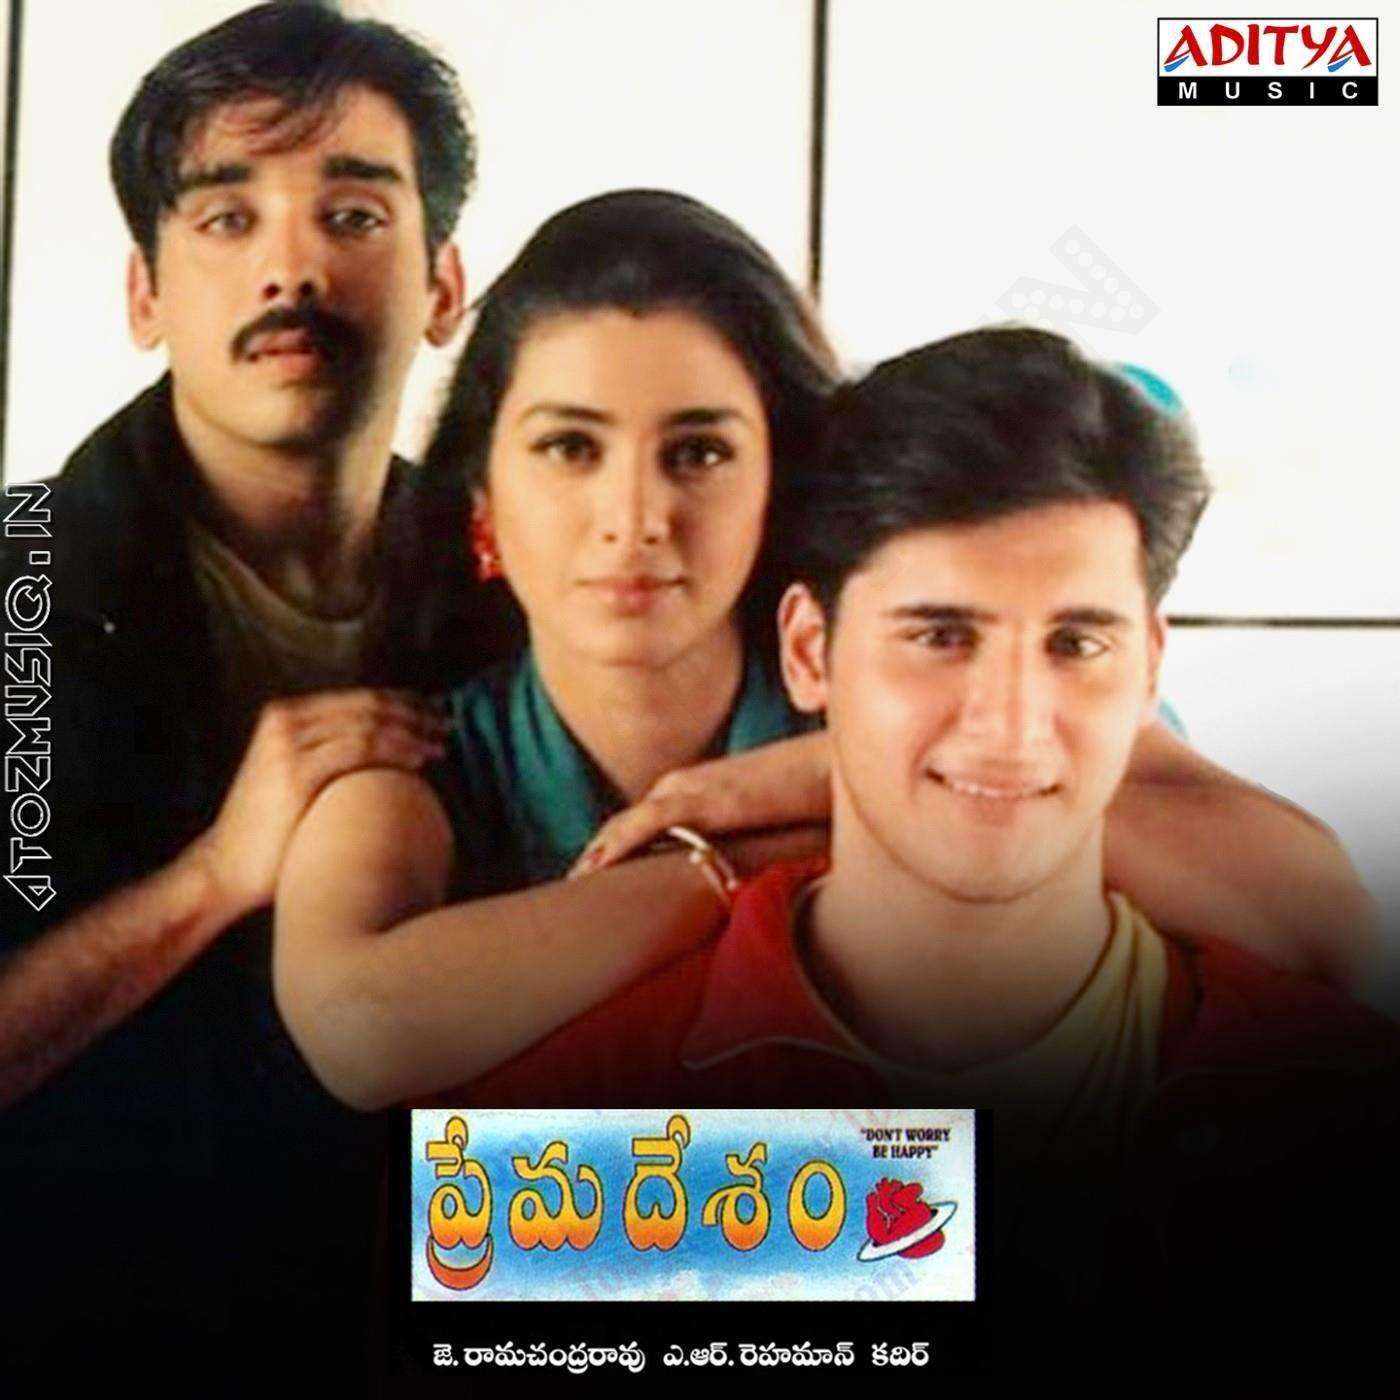 Prema Desam 1996 Flac Mp3 Song Itunes Telugu